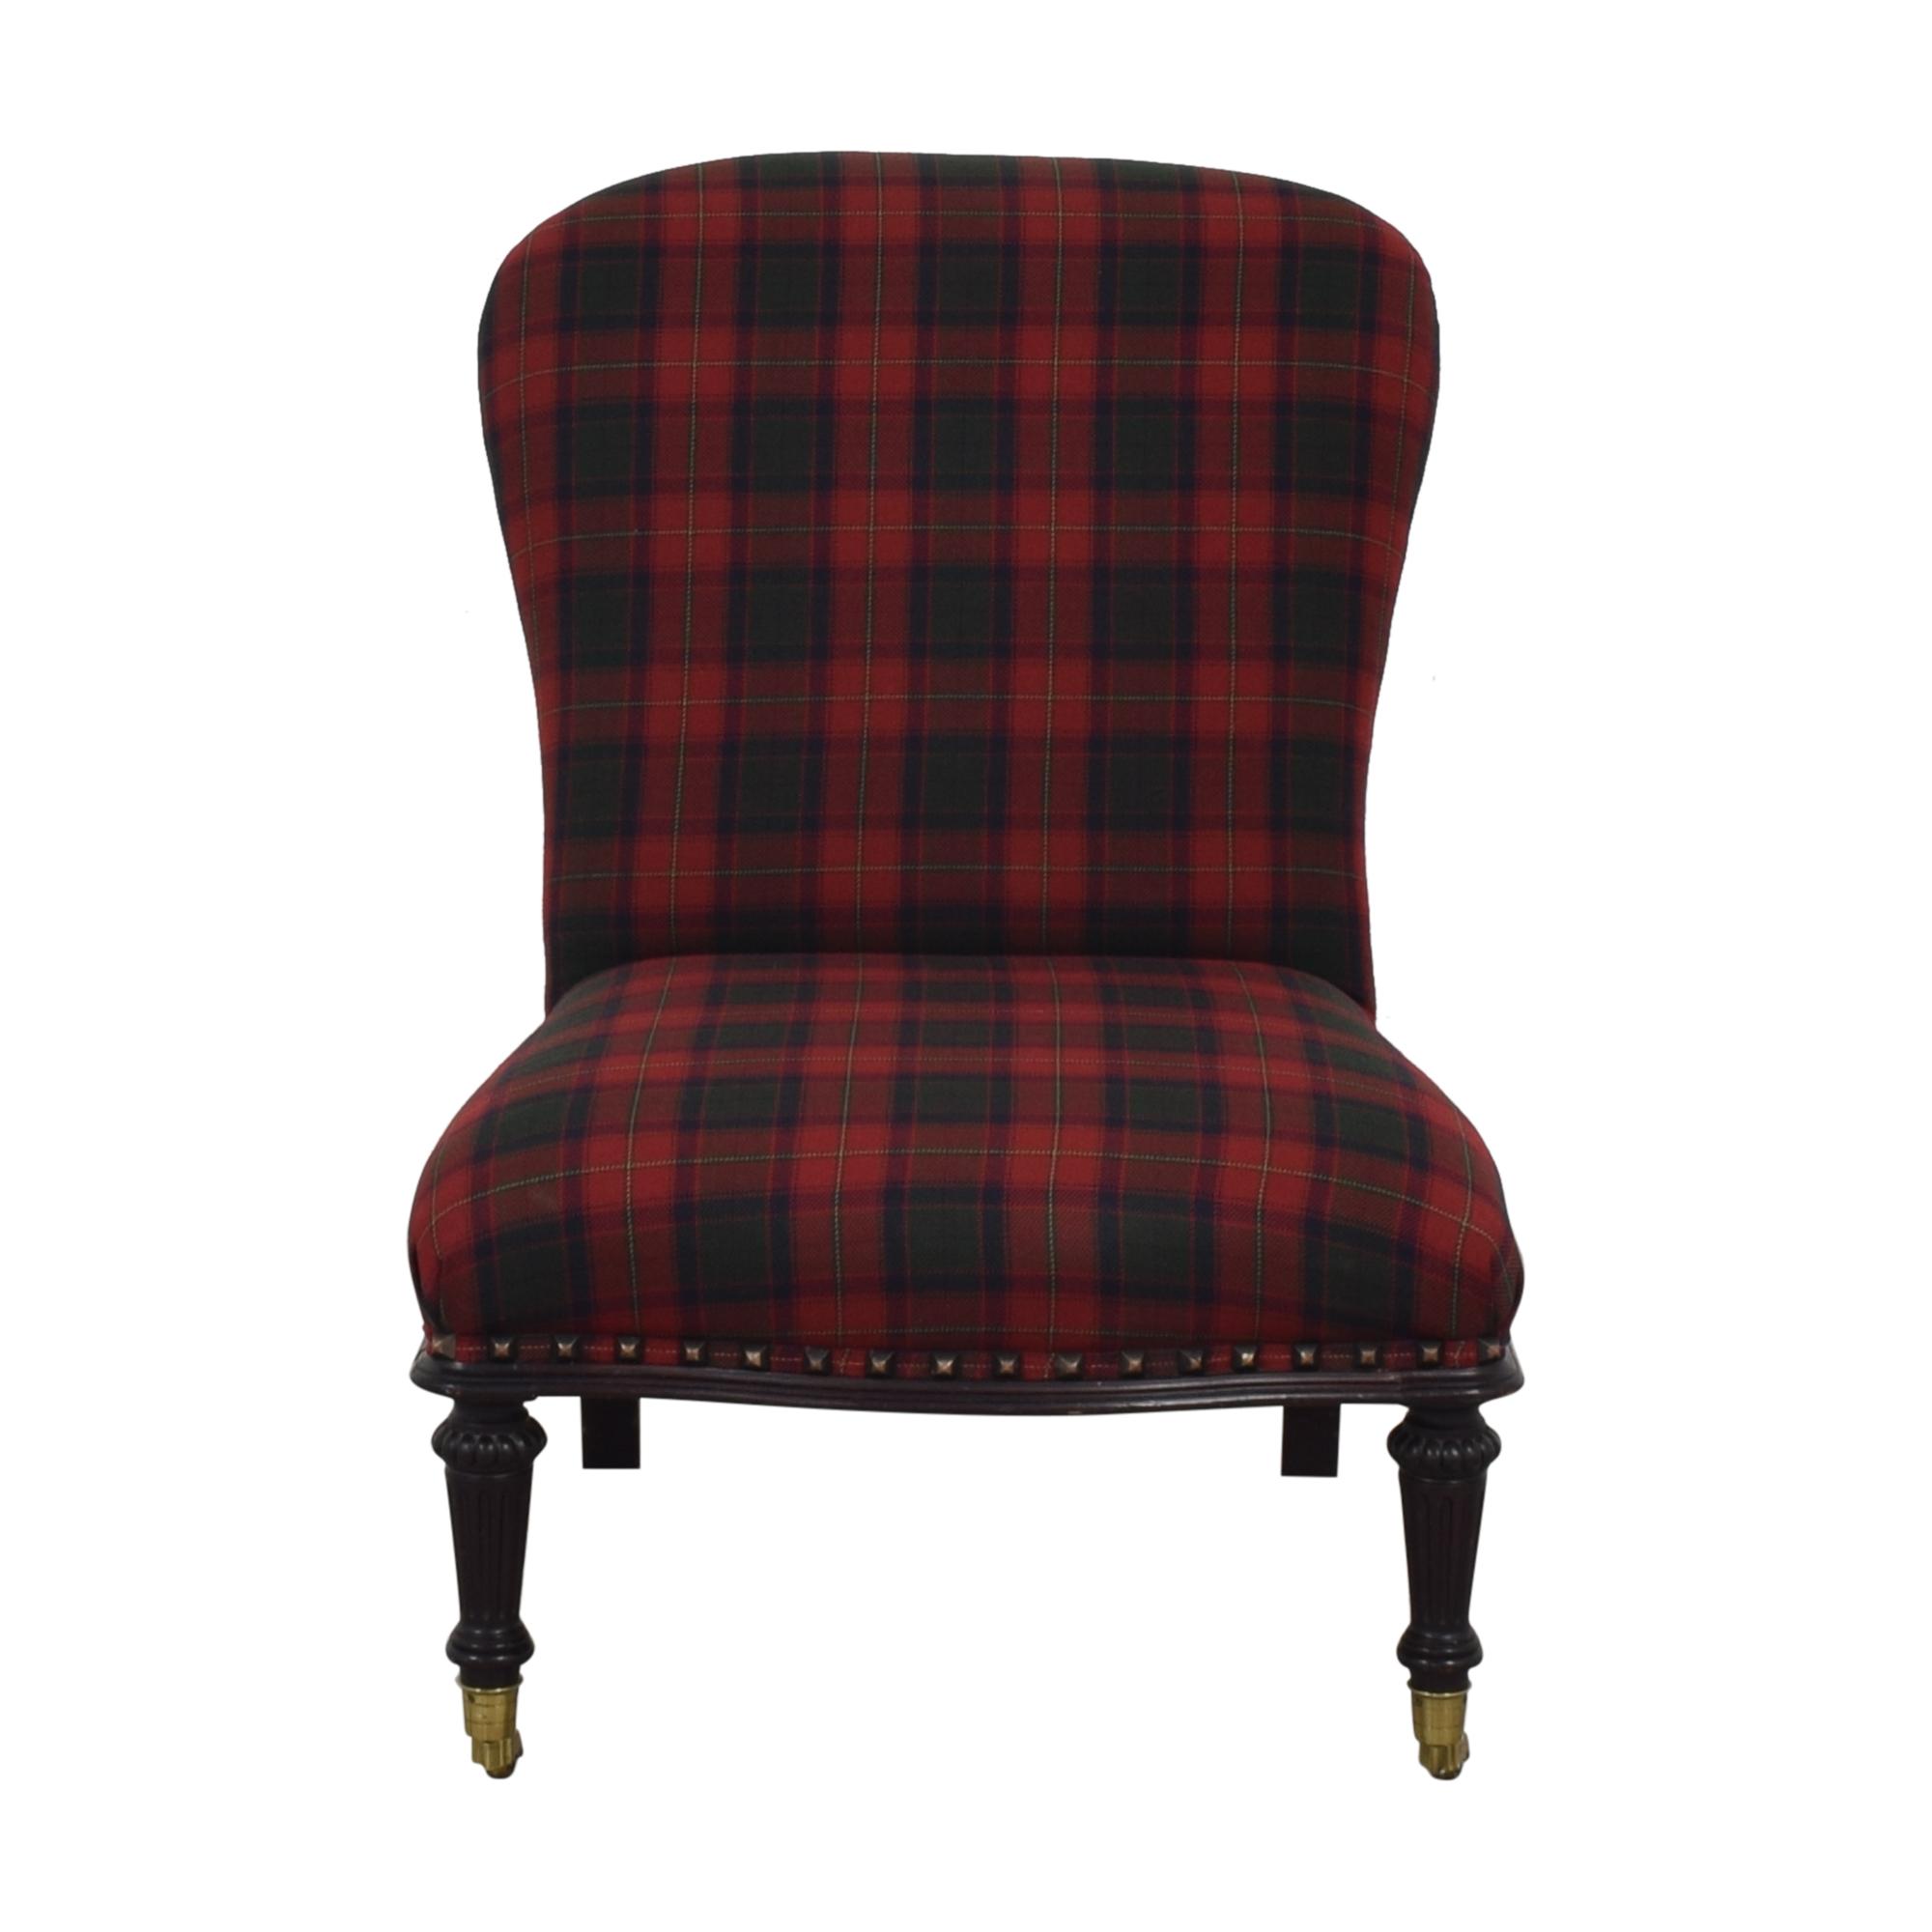 Ralph Lauren Home Ralph Lauren Plaid Chair used